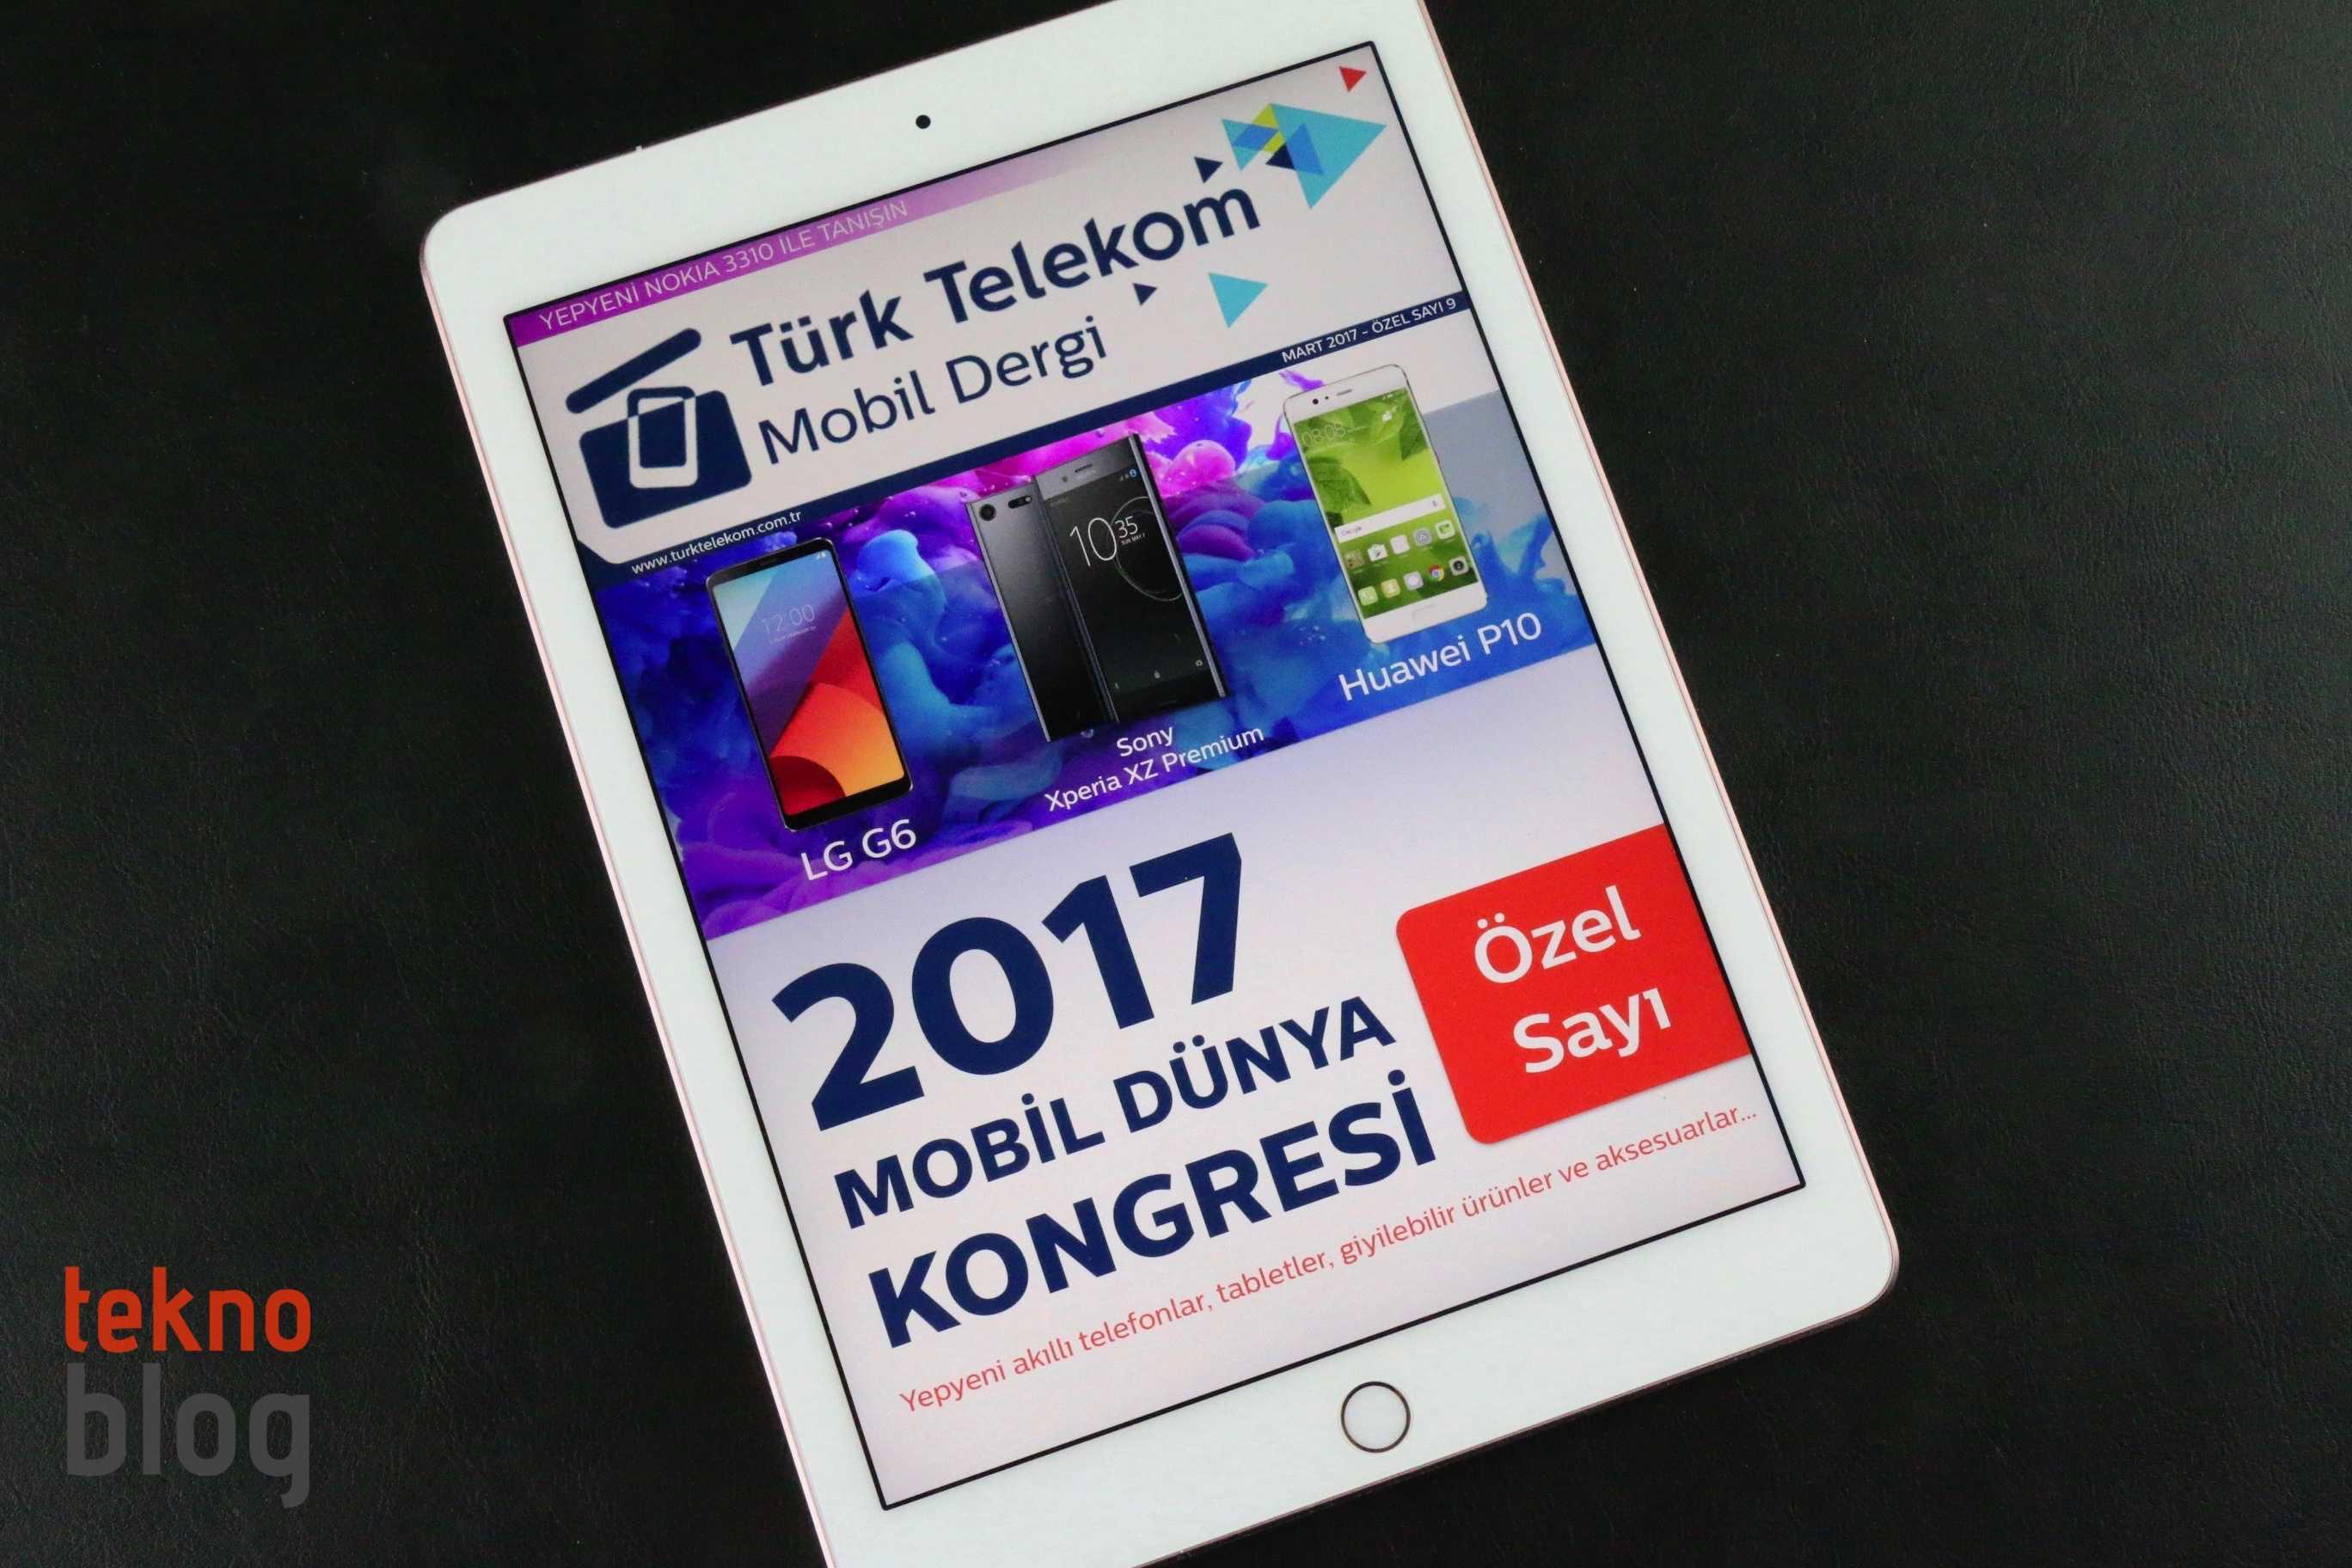 turktelekom-mwc-2017-ozel-sayi-160317